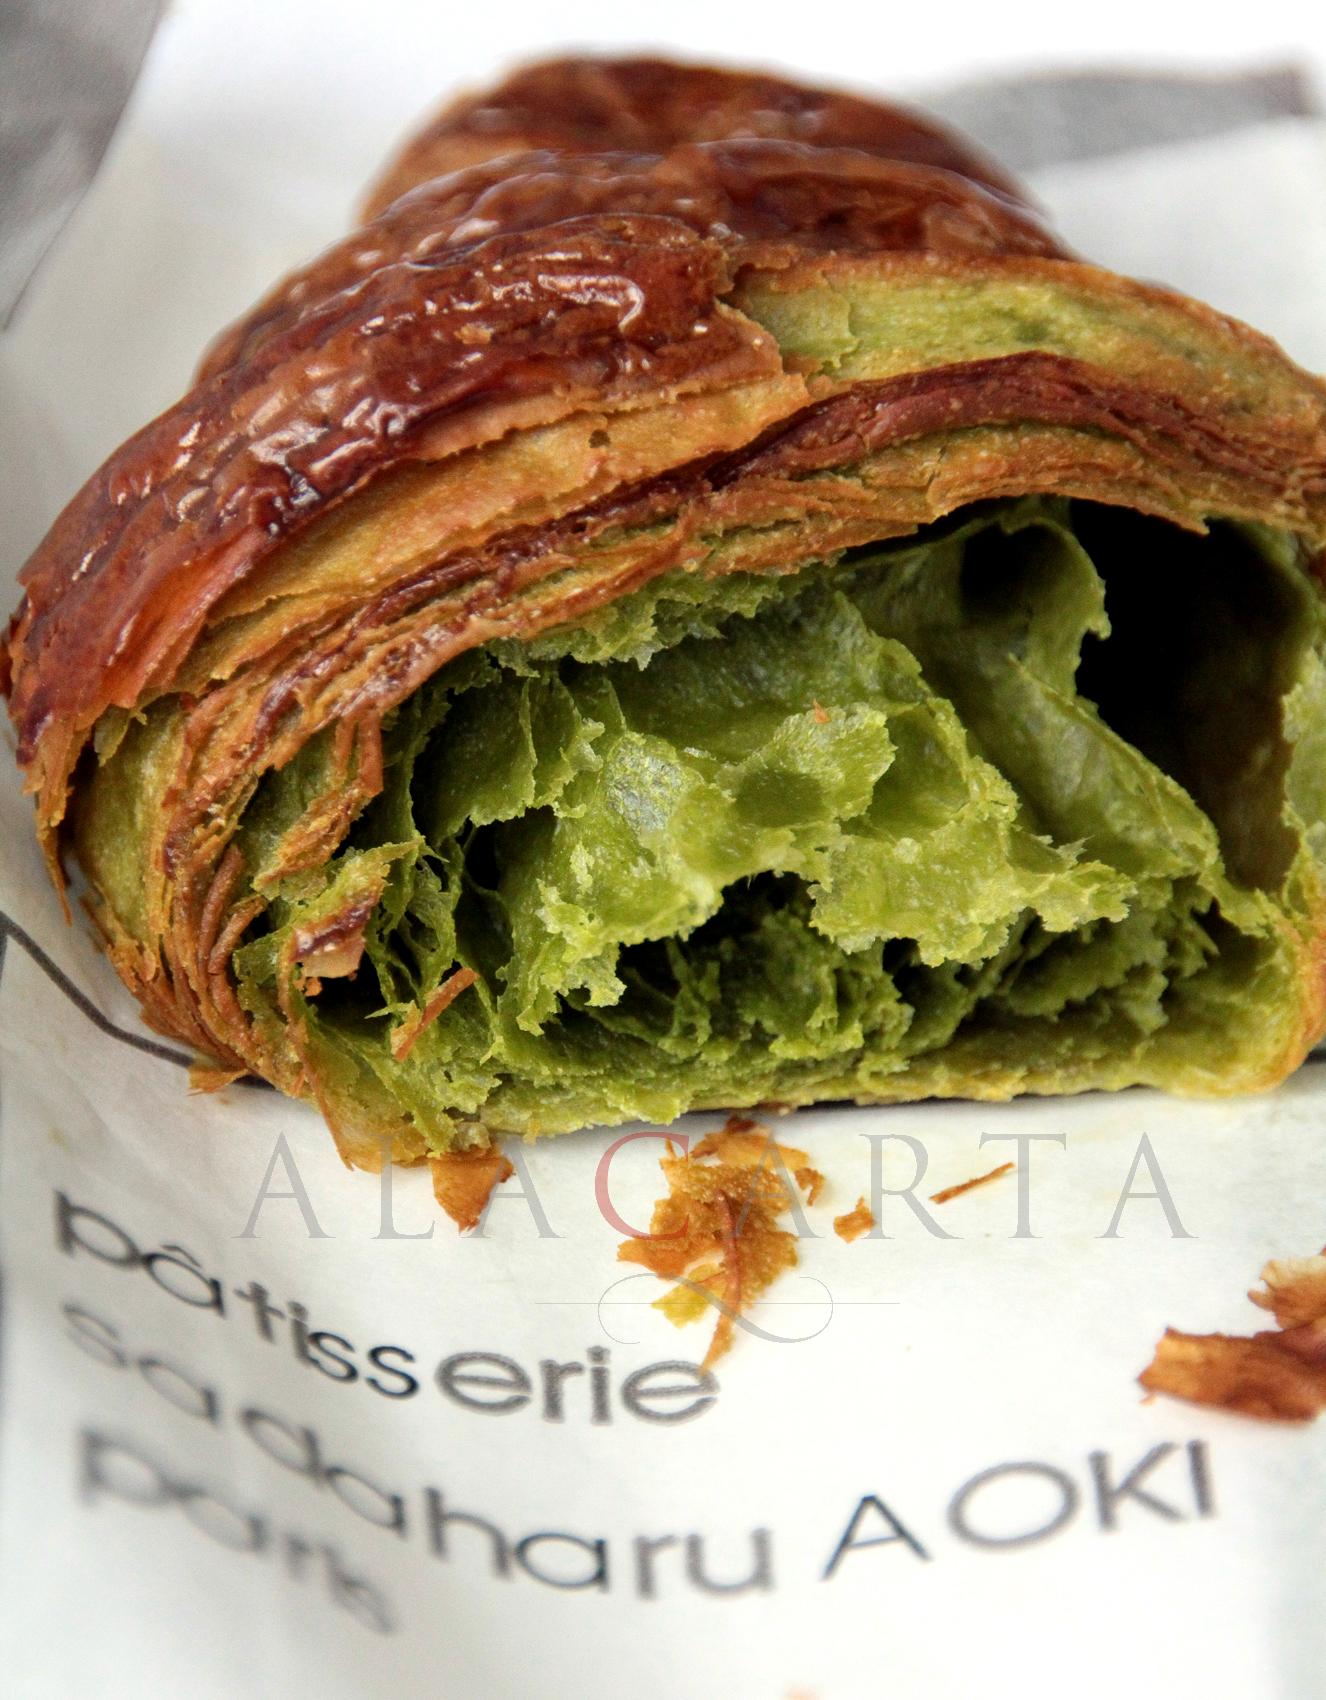 Croissant Matcha Aoki inside